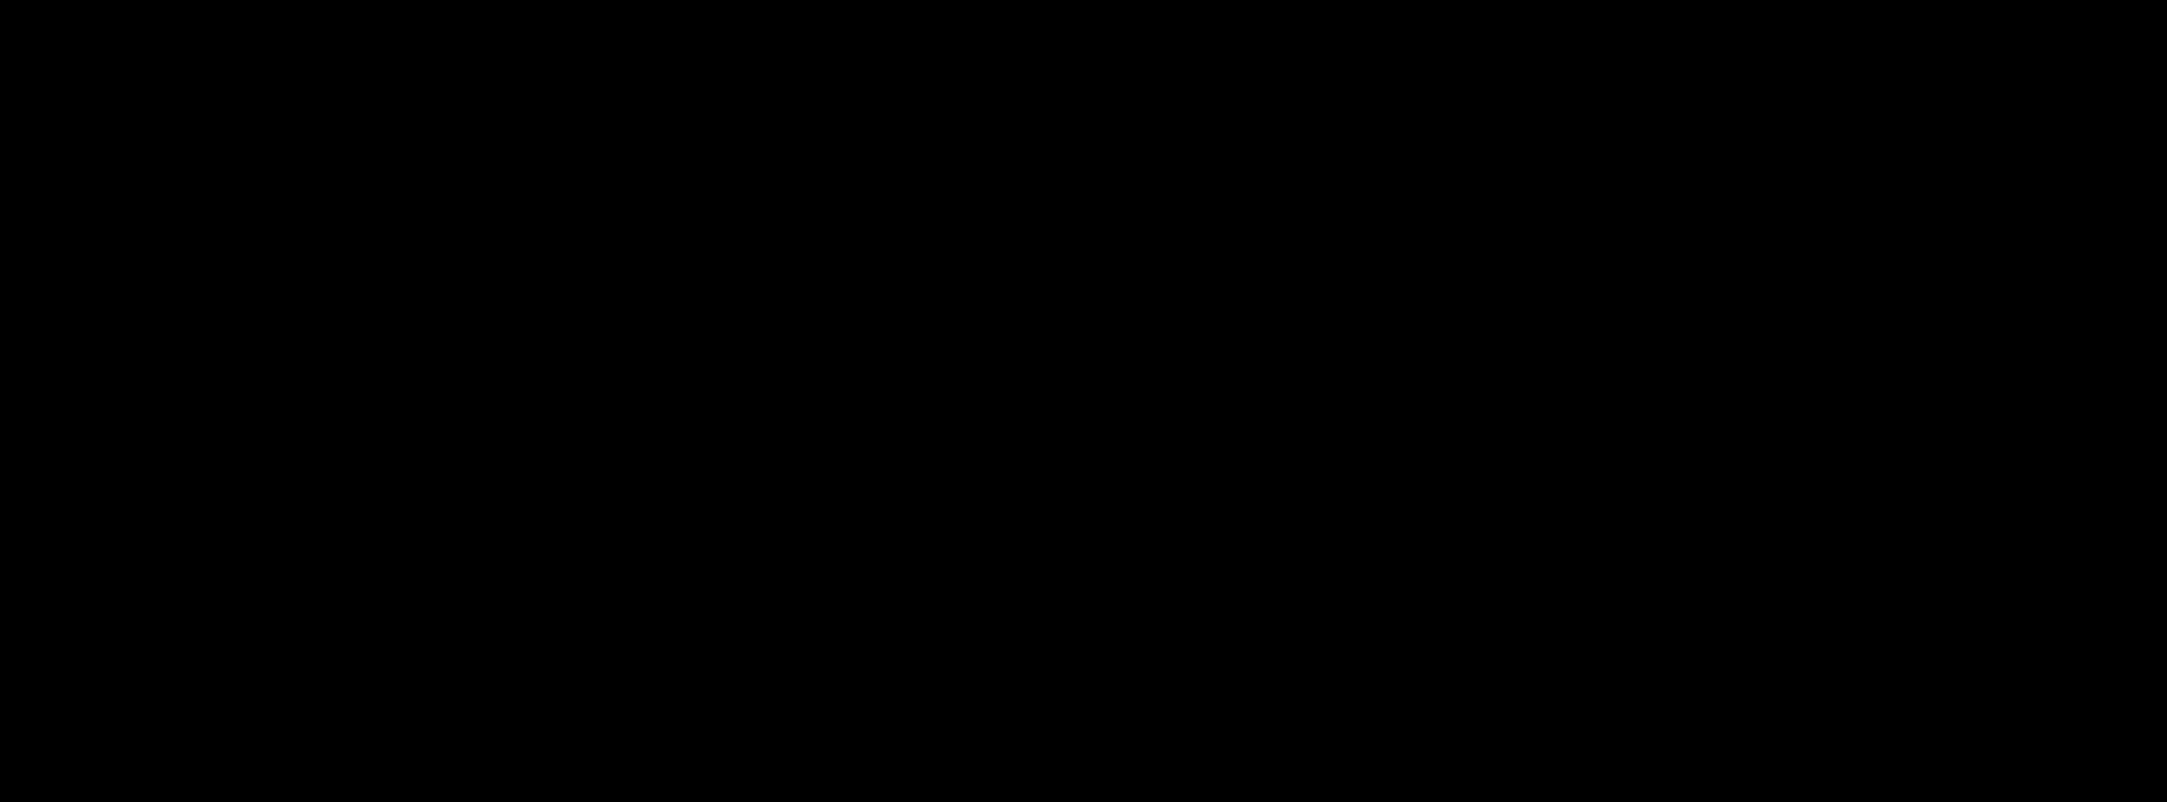 2167x802 Clipart